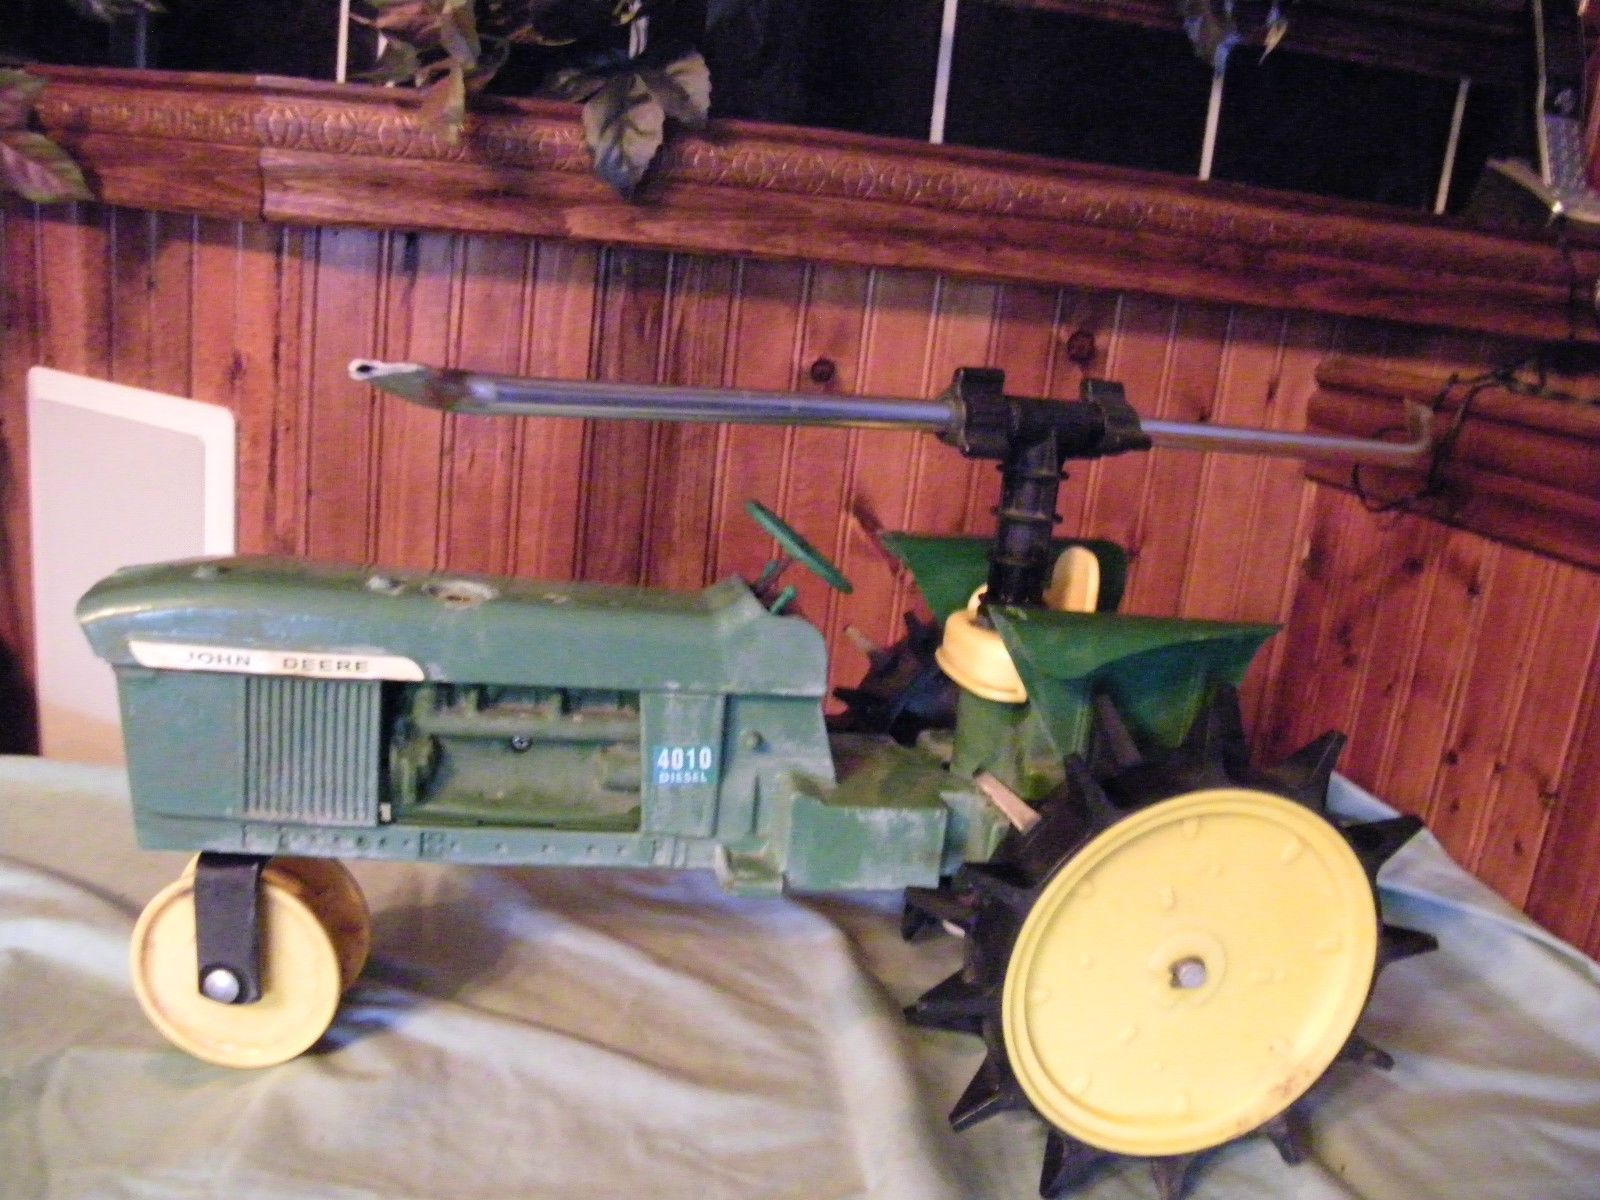 Traveling Lawn Sprinkler Tractor : Gilmour cast iron john deere traveling sprinkler lawn